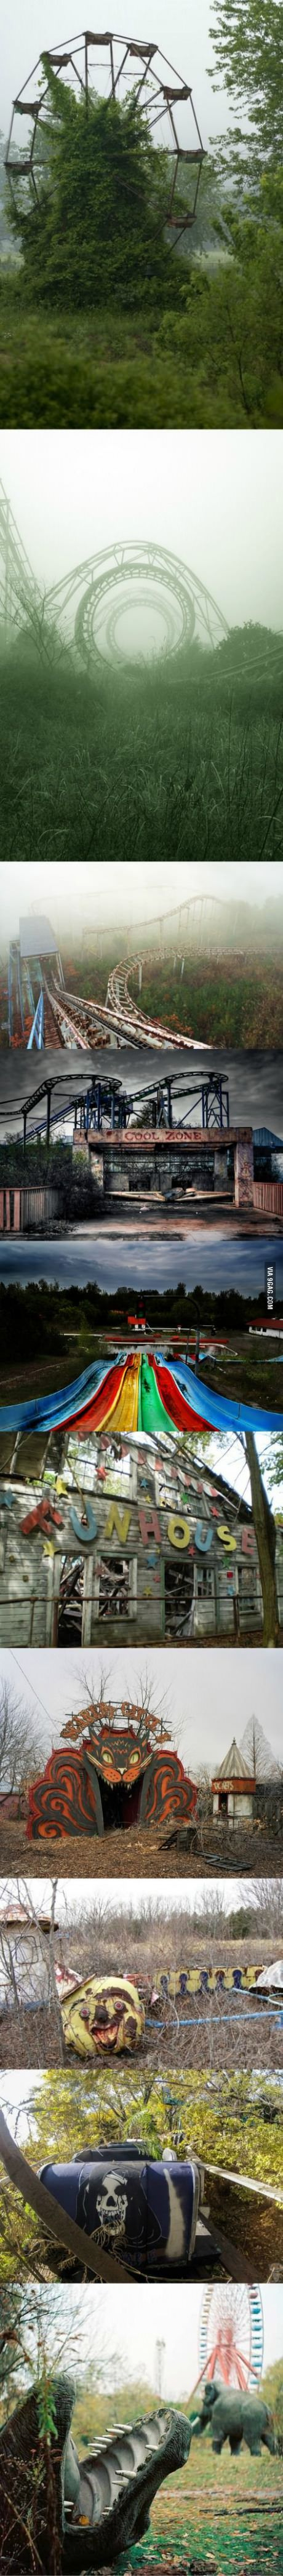 Beautiful and creepy abandoned amusement parks.